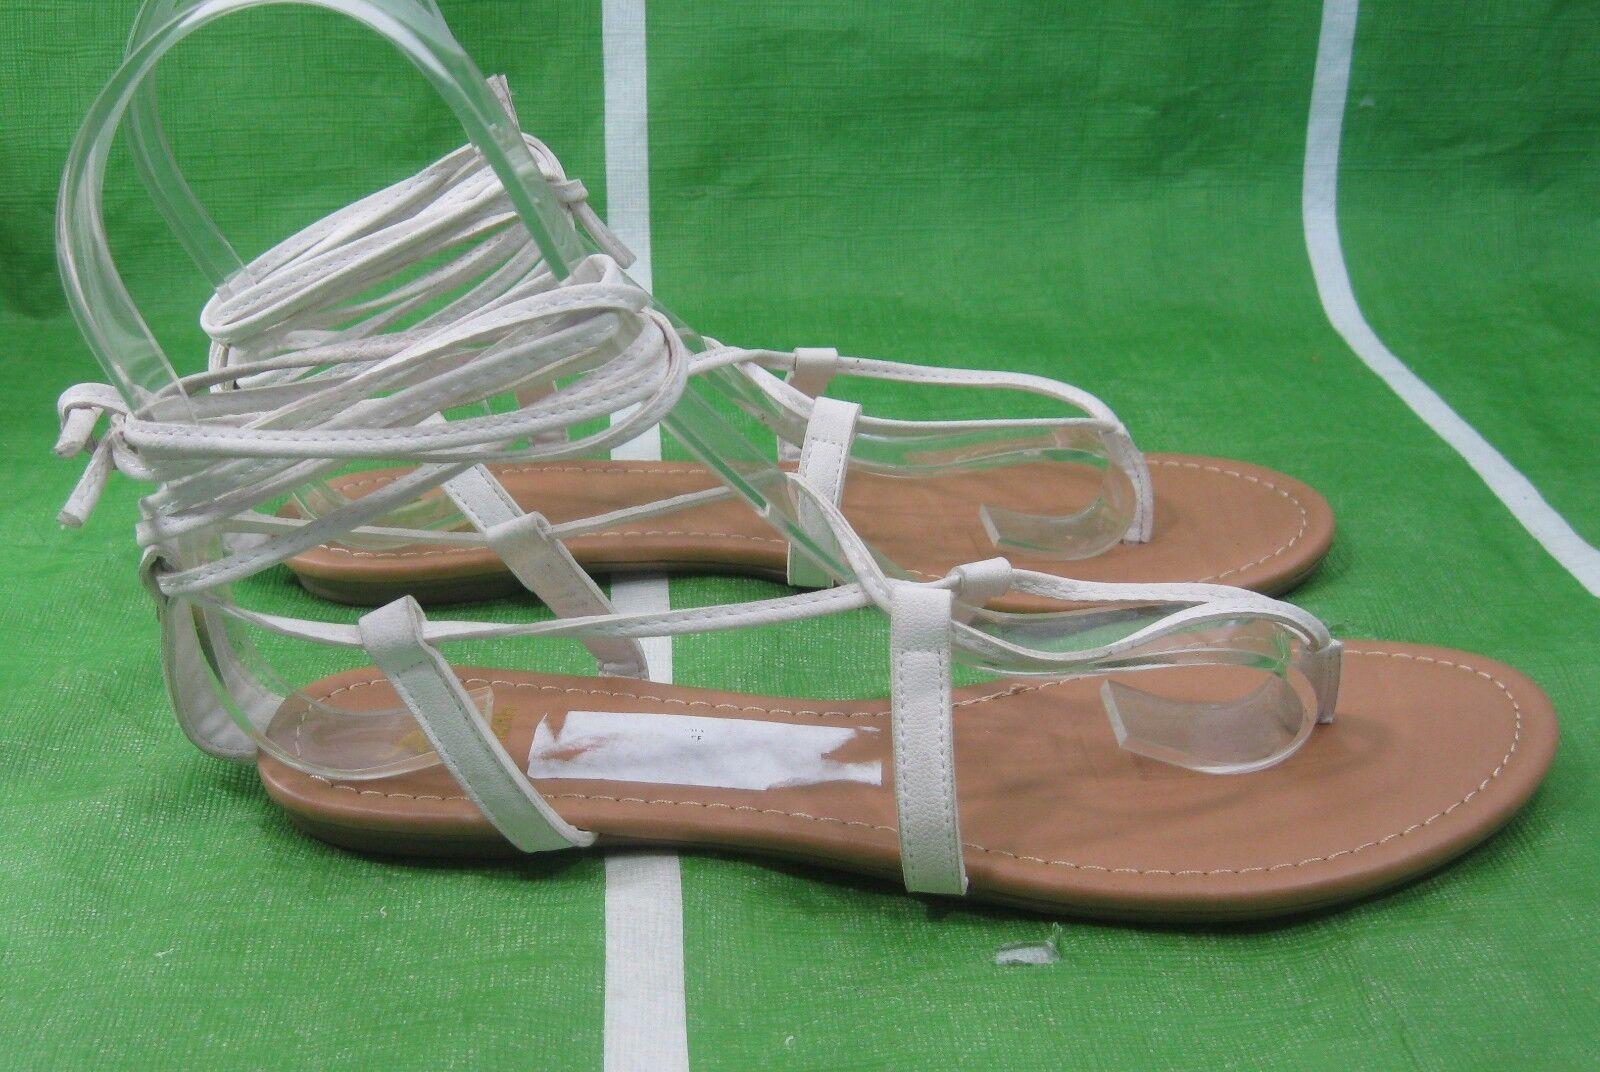 Fitflop iQushion Womens Super Ergonomic Flip Flops Sandals  Size 7 NWT